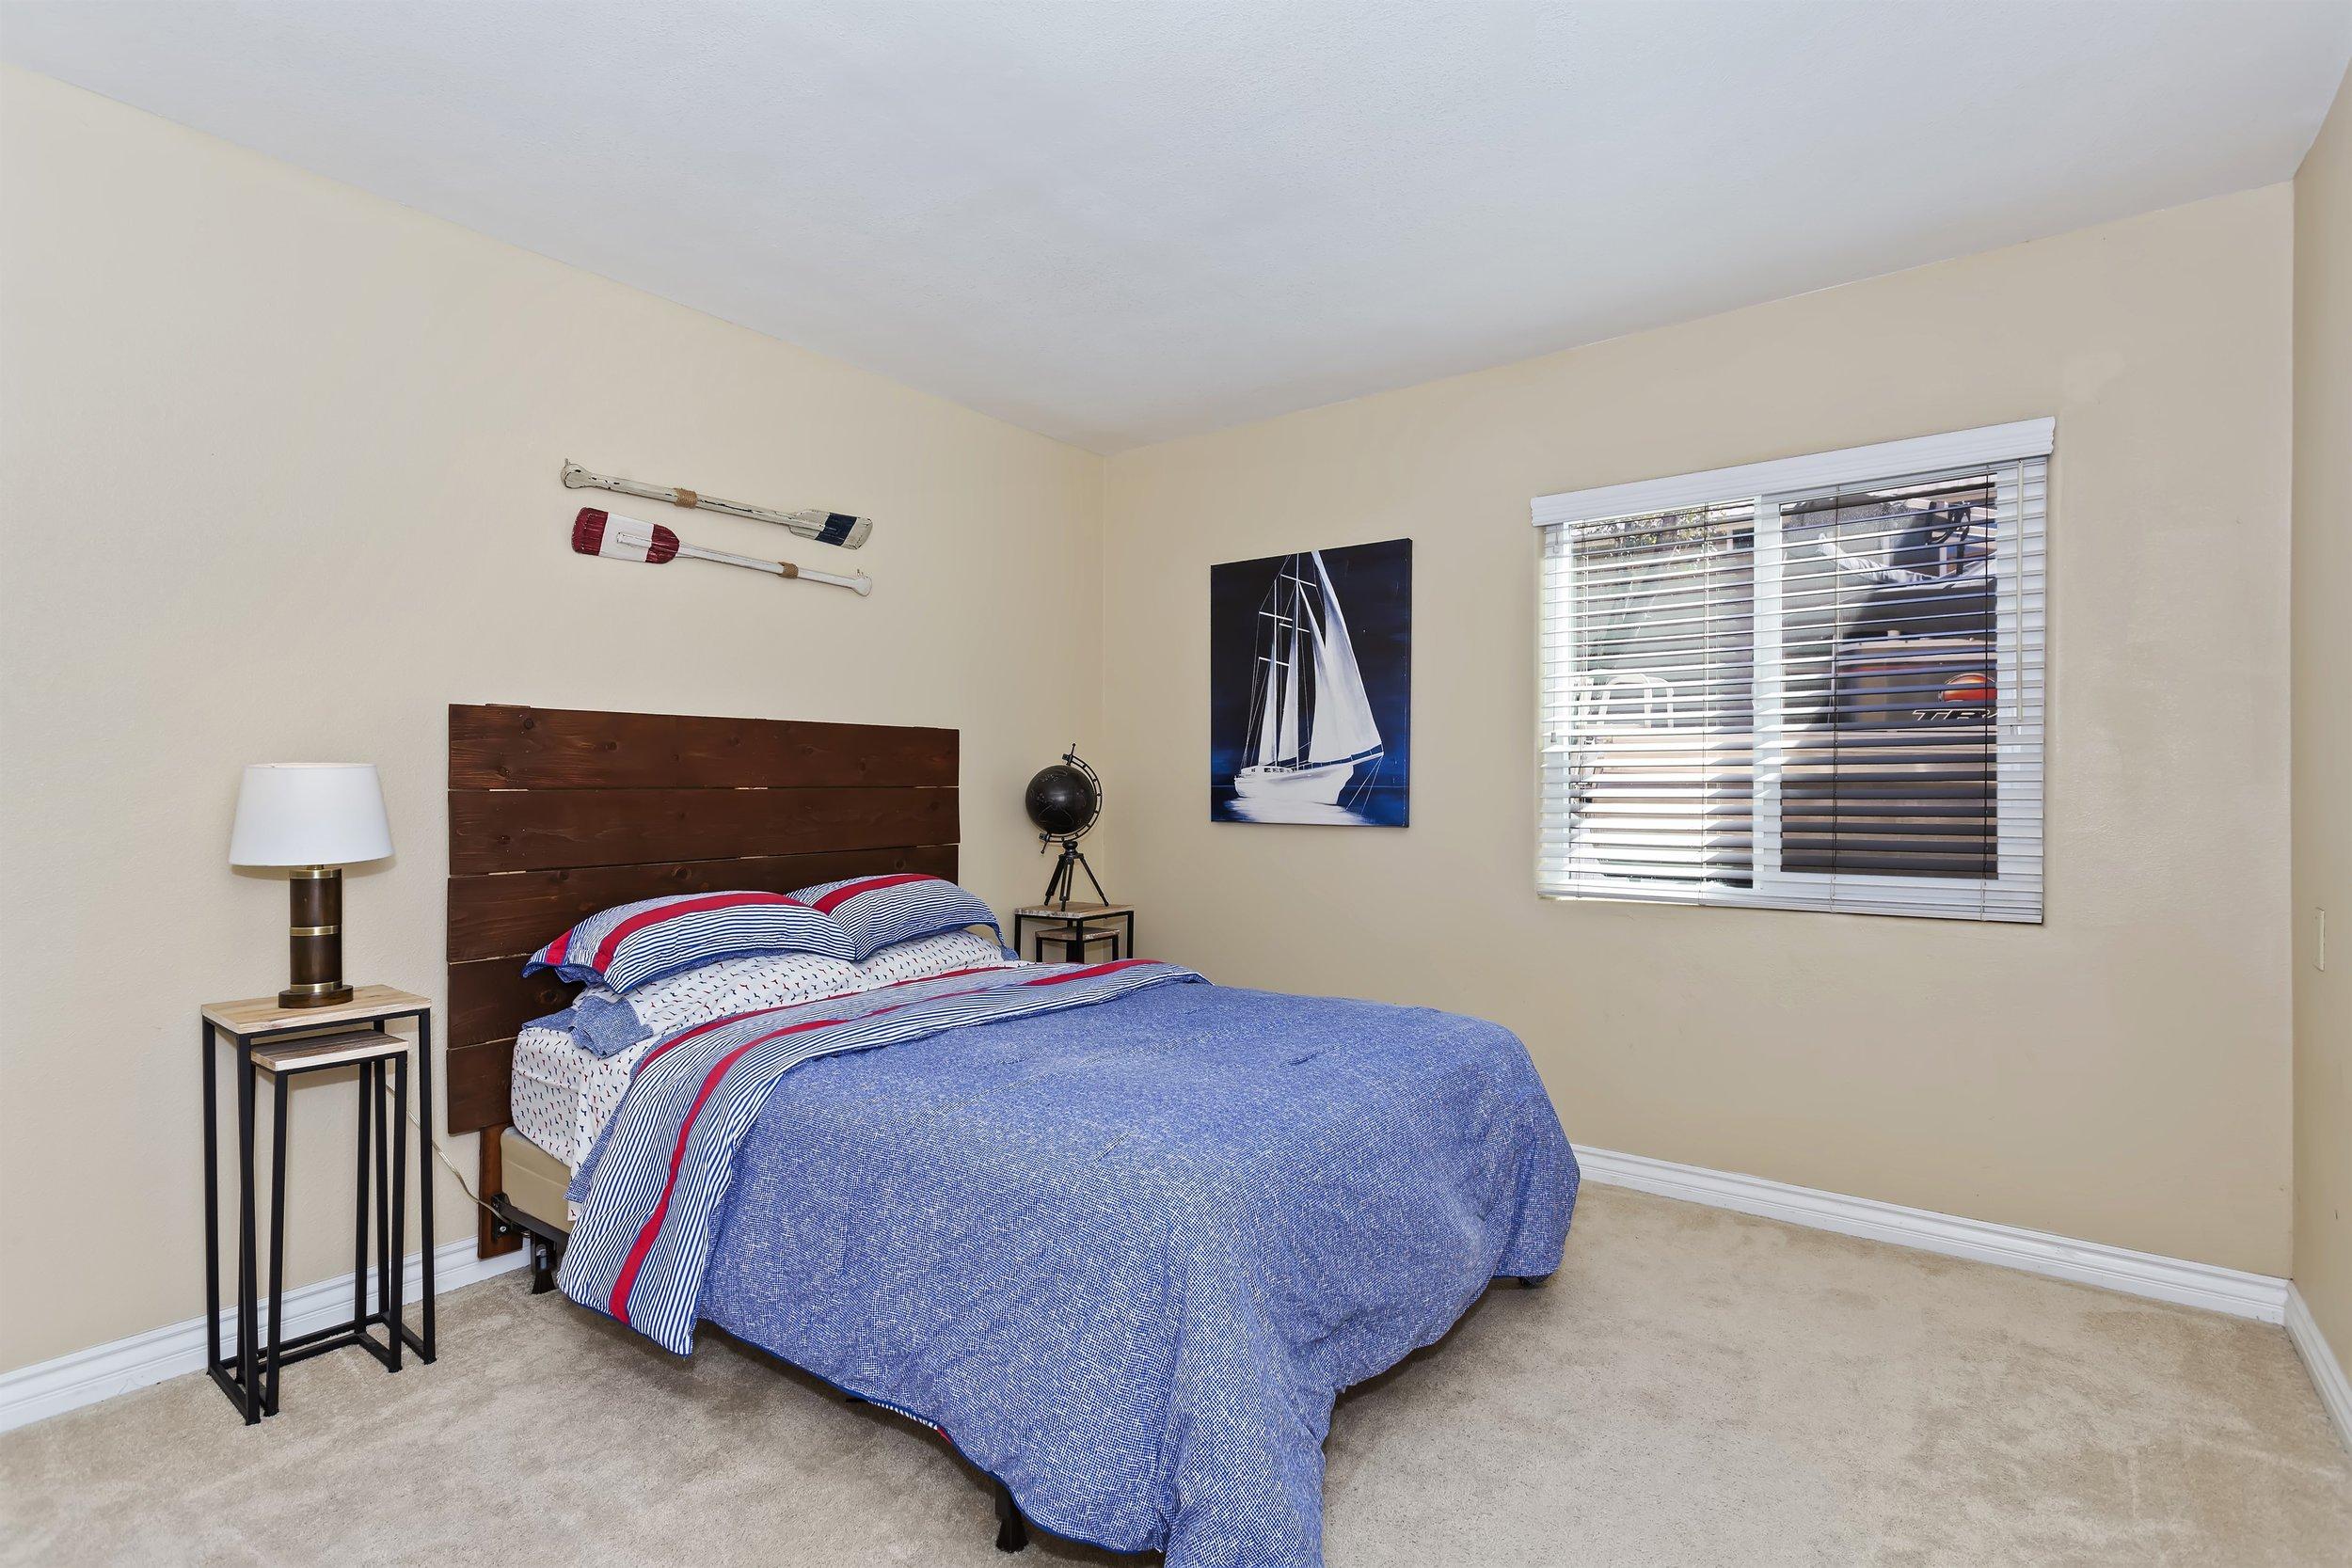 019_Bedroom.jpg